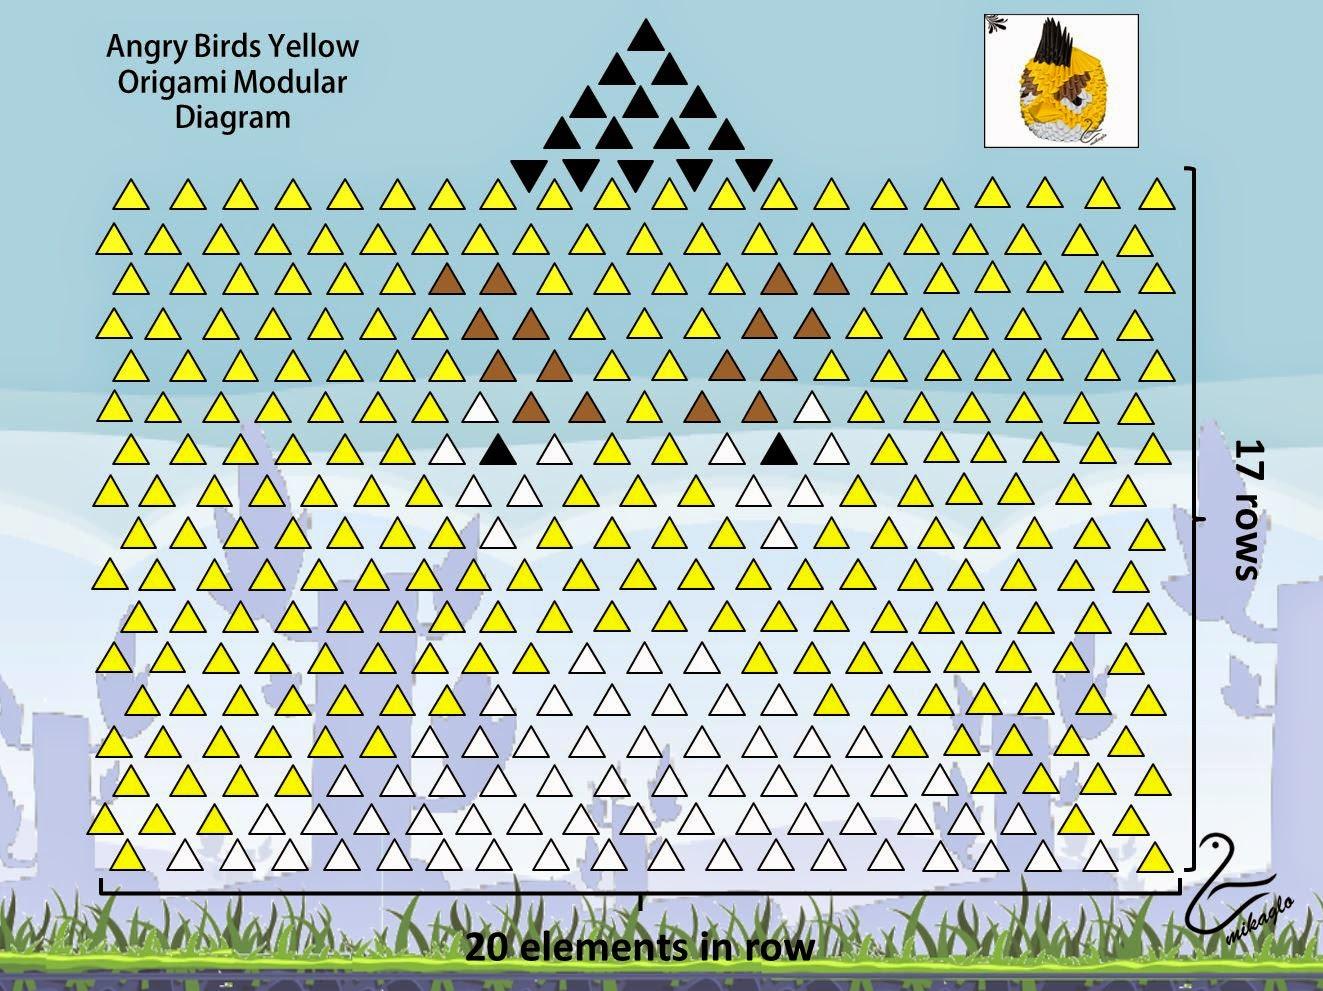 3d Origami Diagram Animals King Kutter Finish Mower Parts Mikaglo 39 Żółty Angry Birds Z Wzór